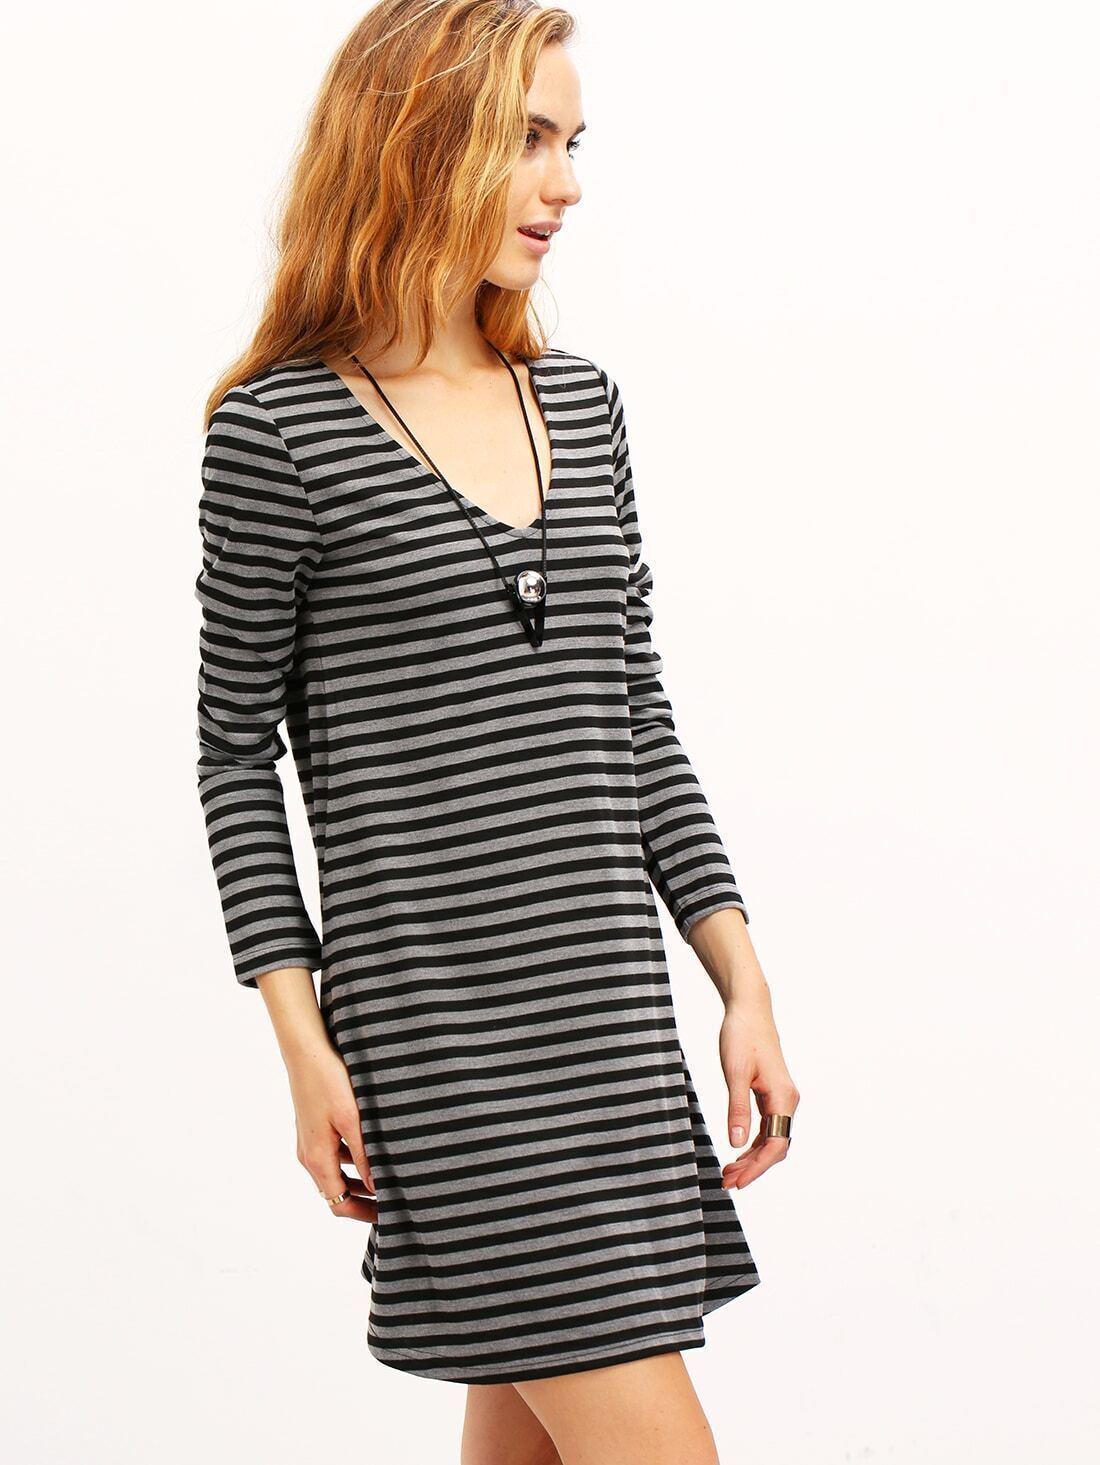 Grey striped t shirt dressfor women romwe Grey striped t shirt